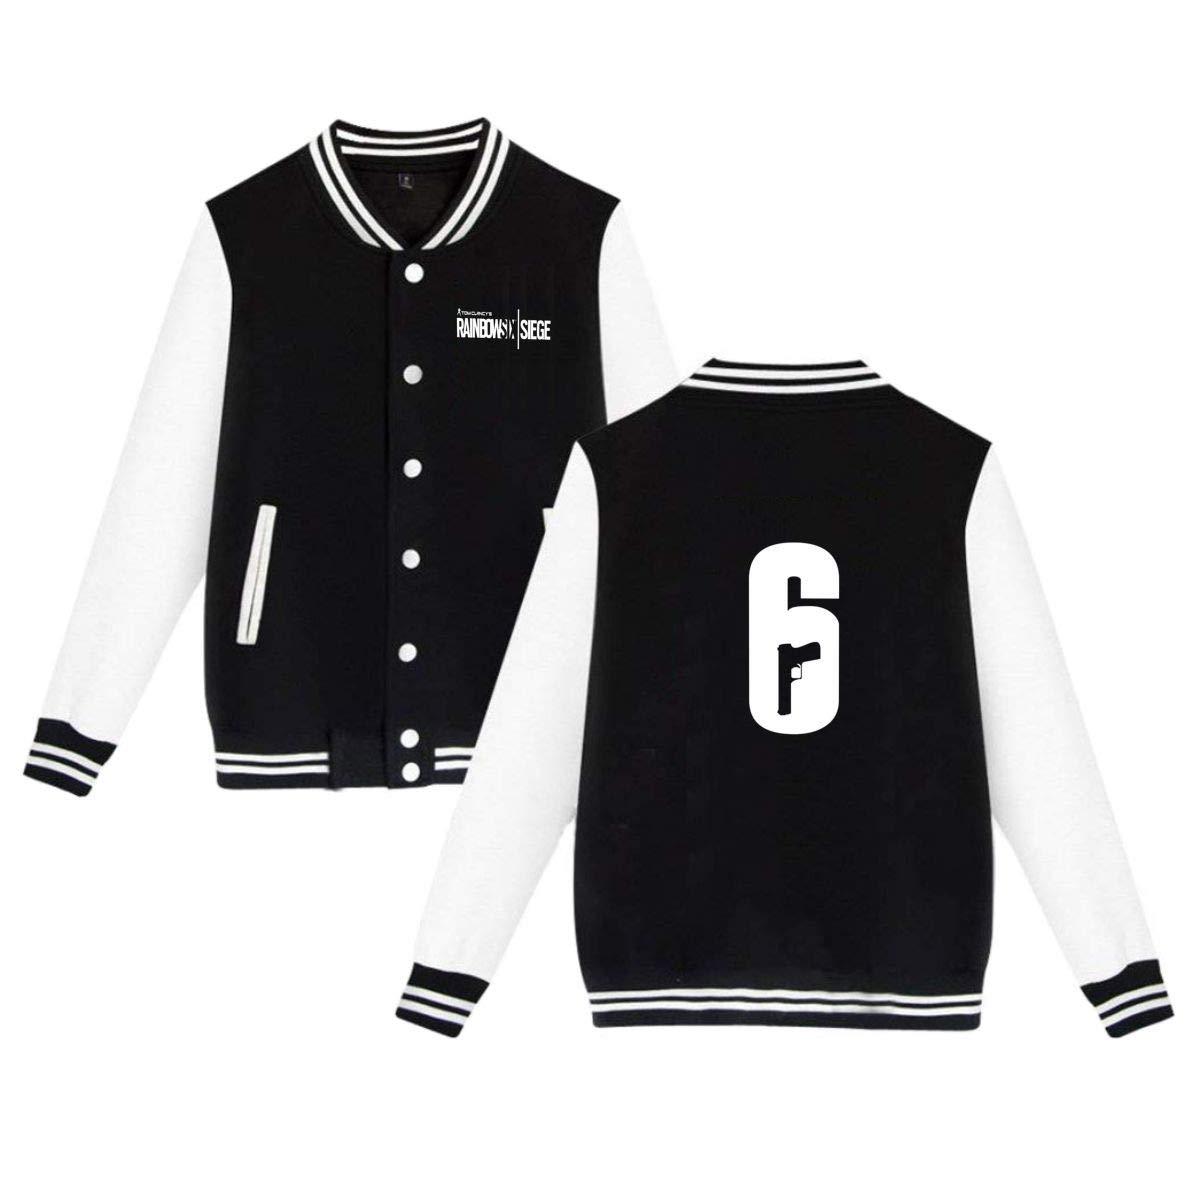 NEST-Homer Unisex Rainbow Six Siege Logo Velvet Baseball Uniform Jacket Coat Sweater Sweatshirt